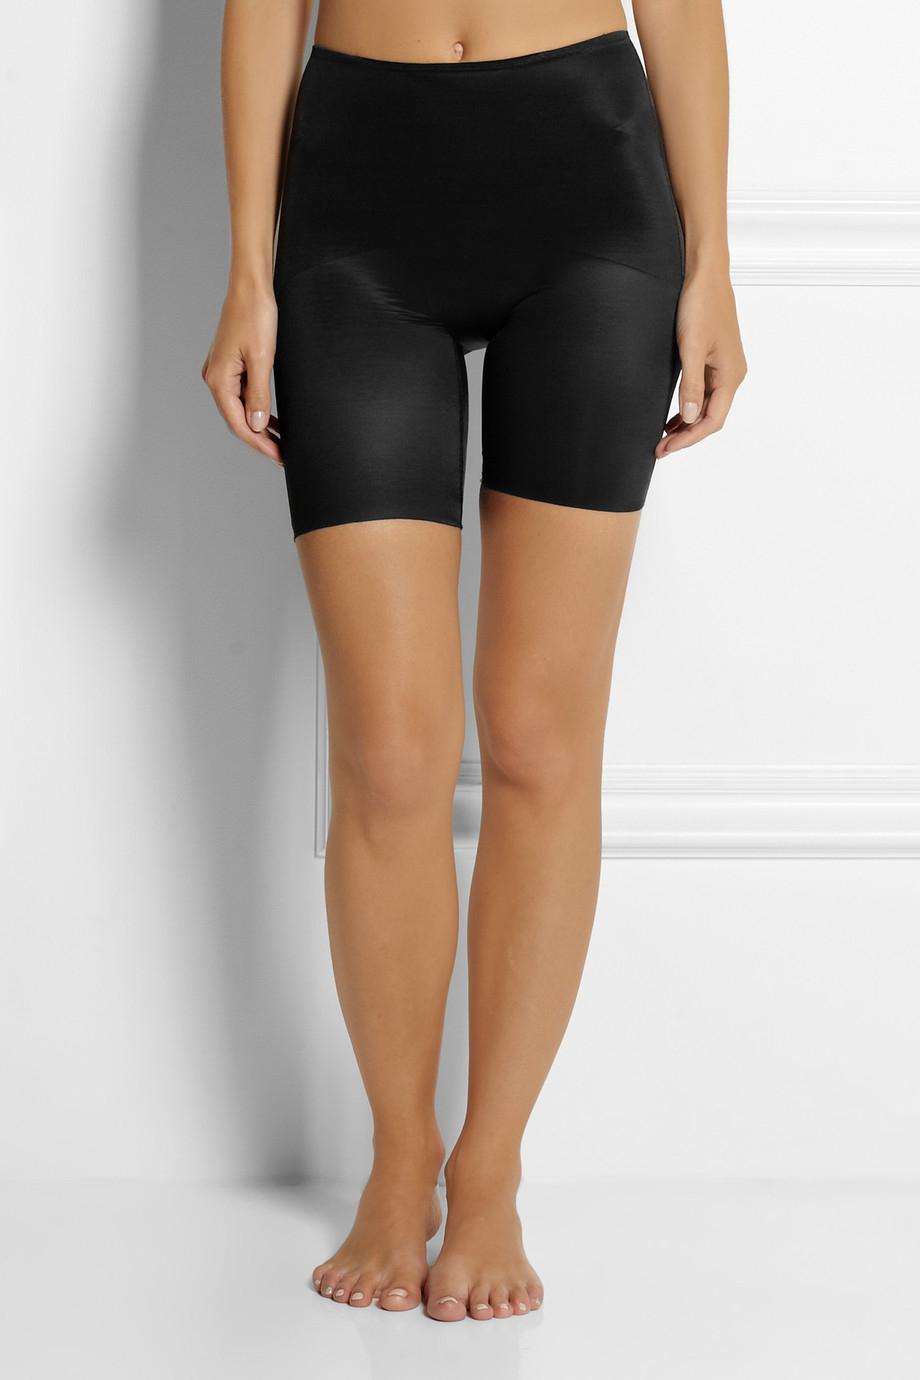 213b40a8f2 Intimates Skinny Britches Shorts